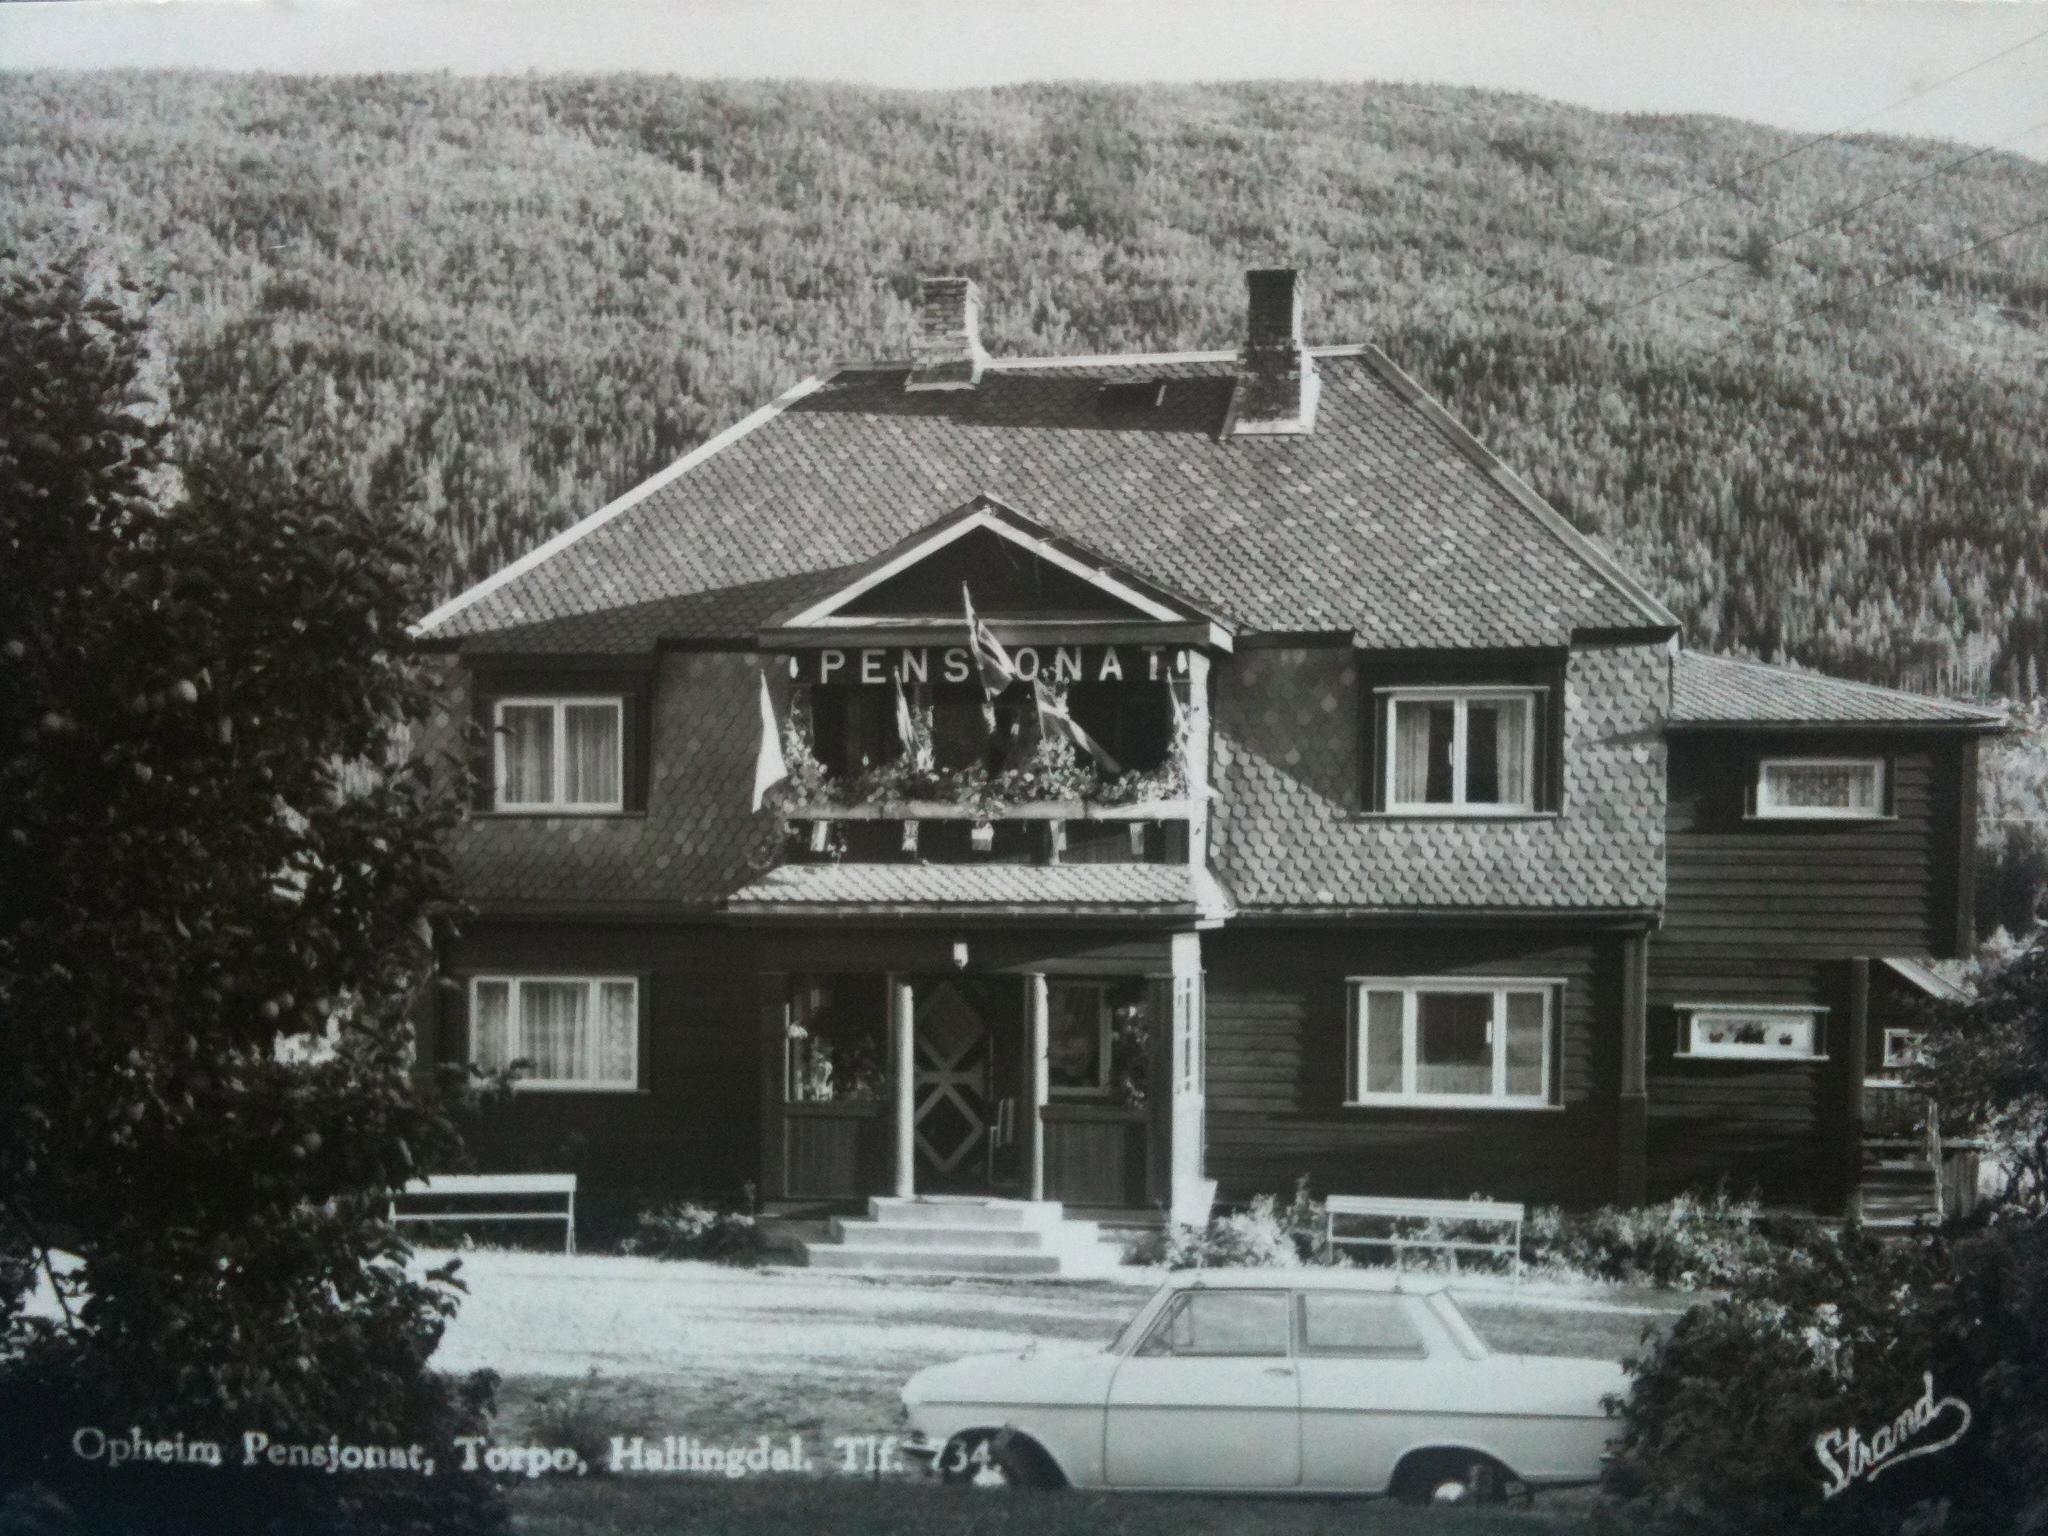 Postkort 1957 / Postcard 1957